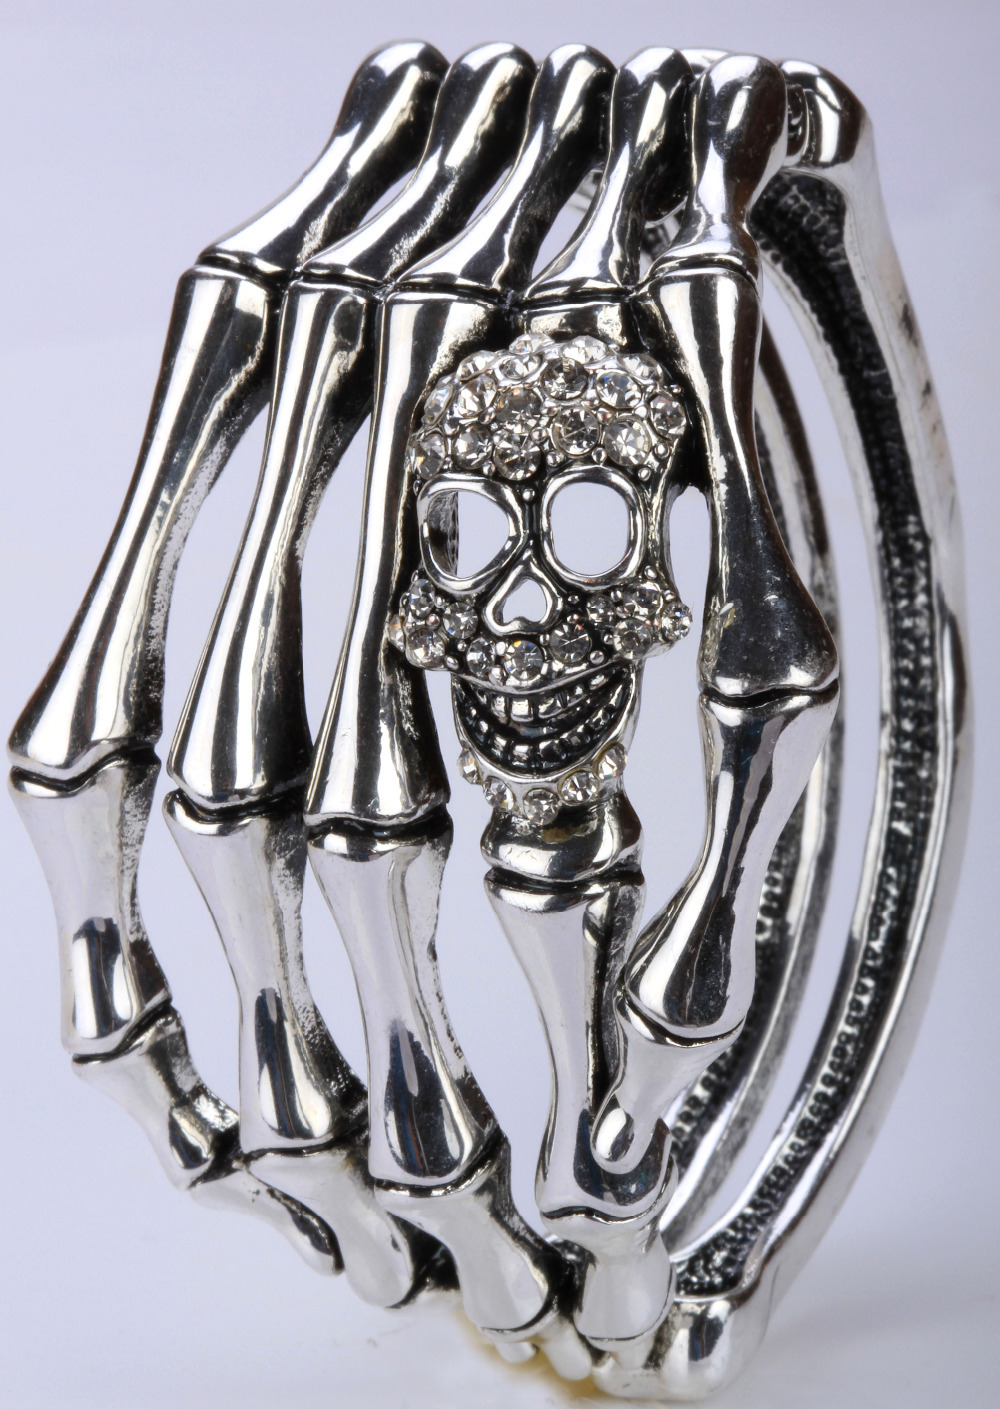 Skull skeleton hand bone bracelet bangle biker gothic bling jewelry gifts for women D08 wholesale dropshipping(China (Mainland))